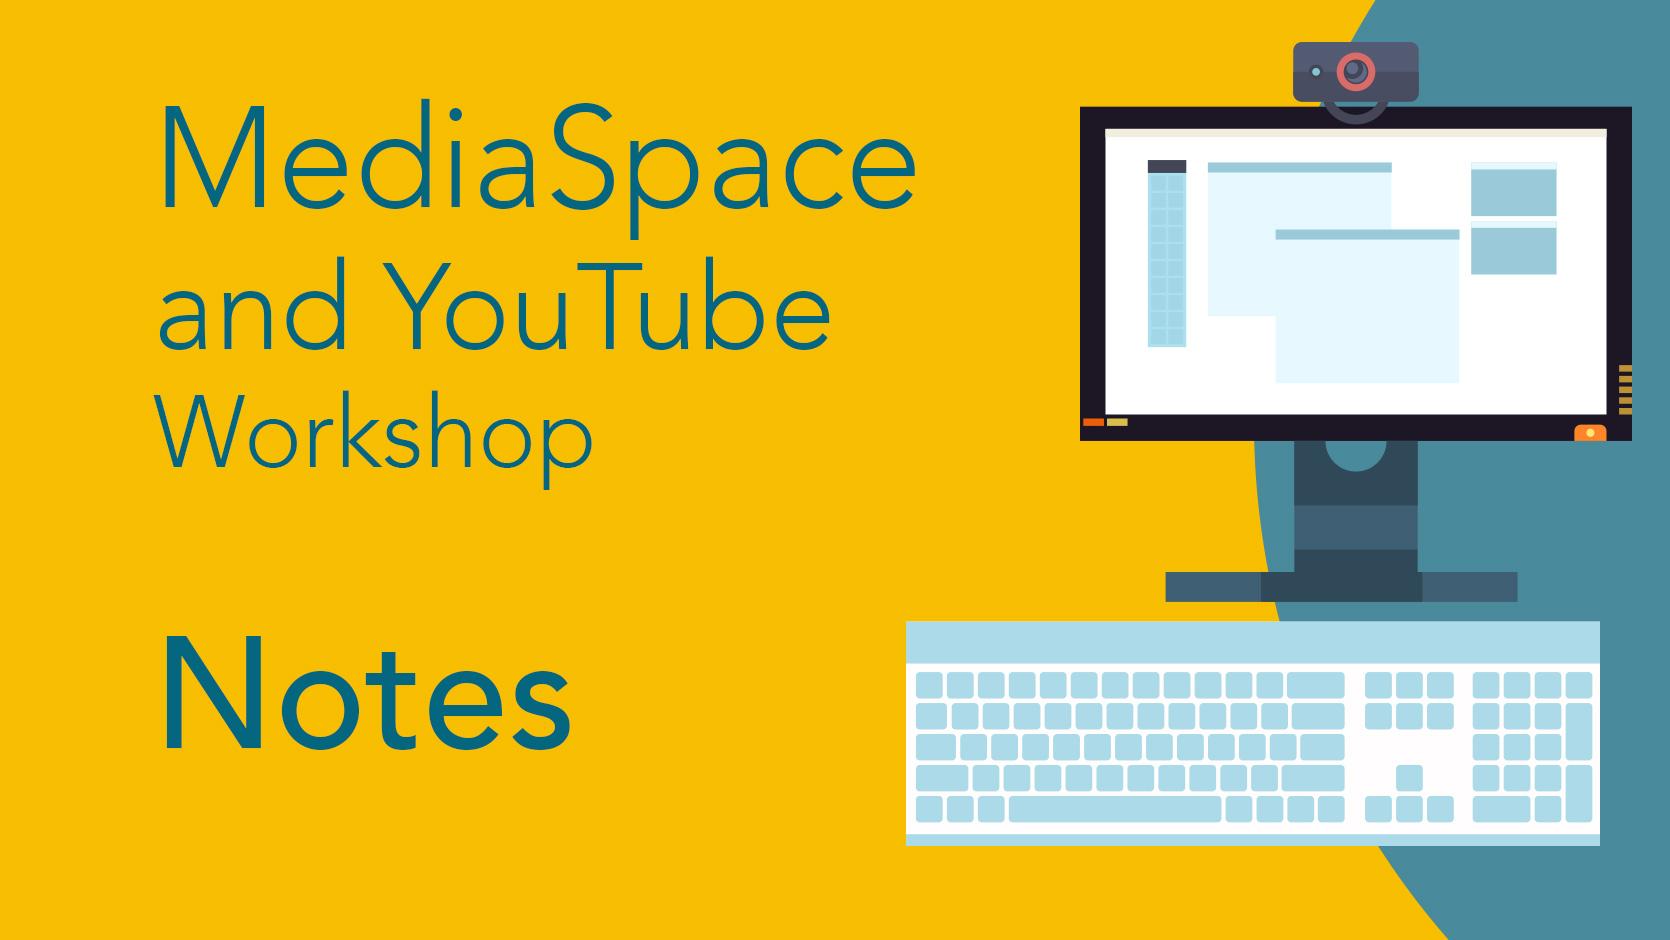 workshop.-title-2.jpg